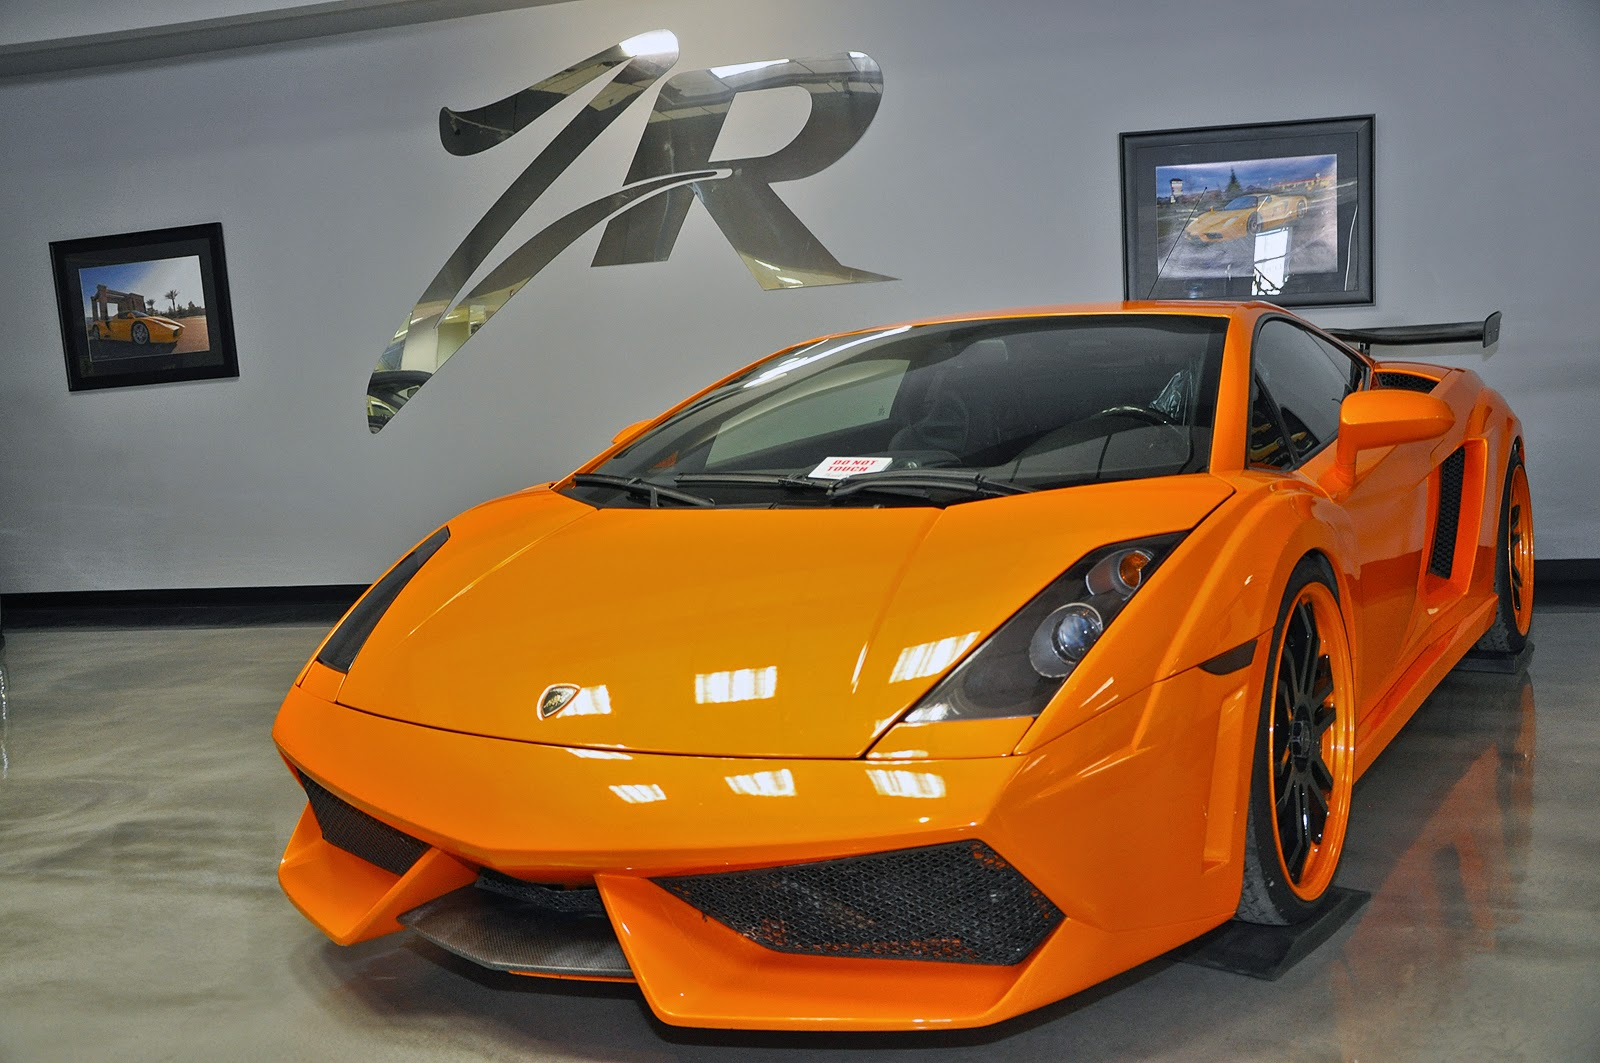 Zr Auto Blog Orange Heffner Twin Turbo Gallardo Ready For A New Wrap